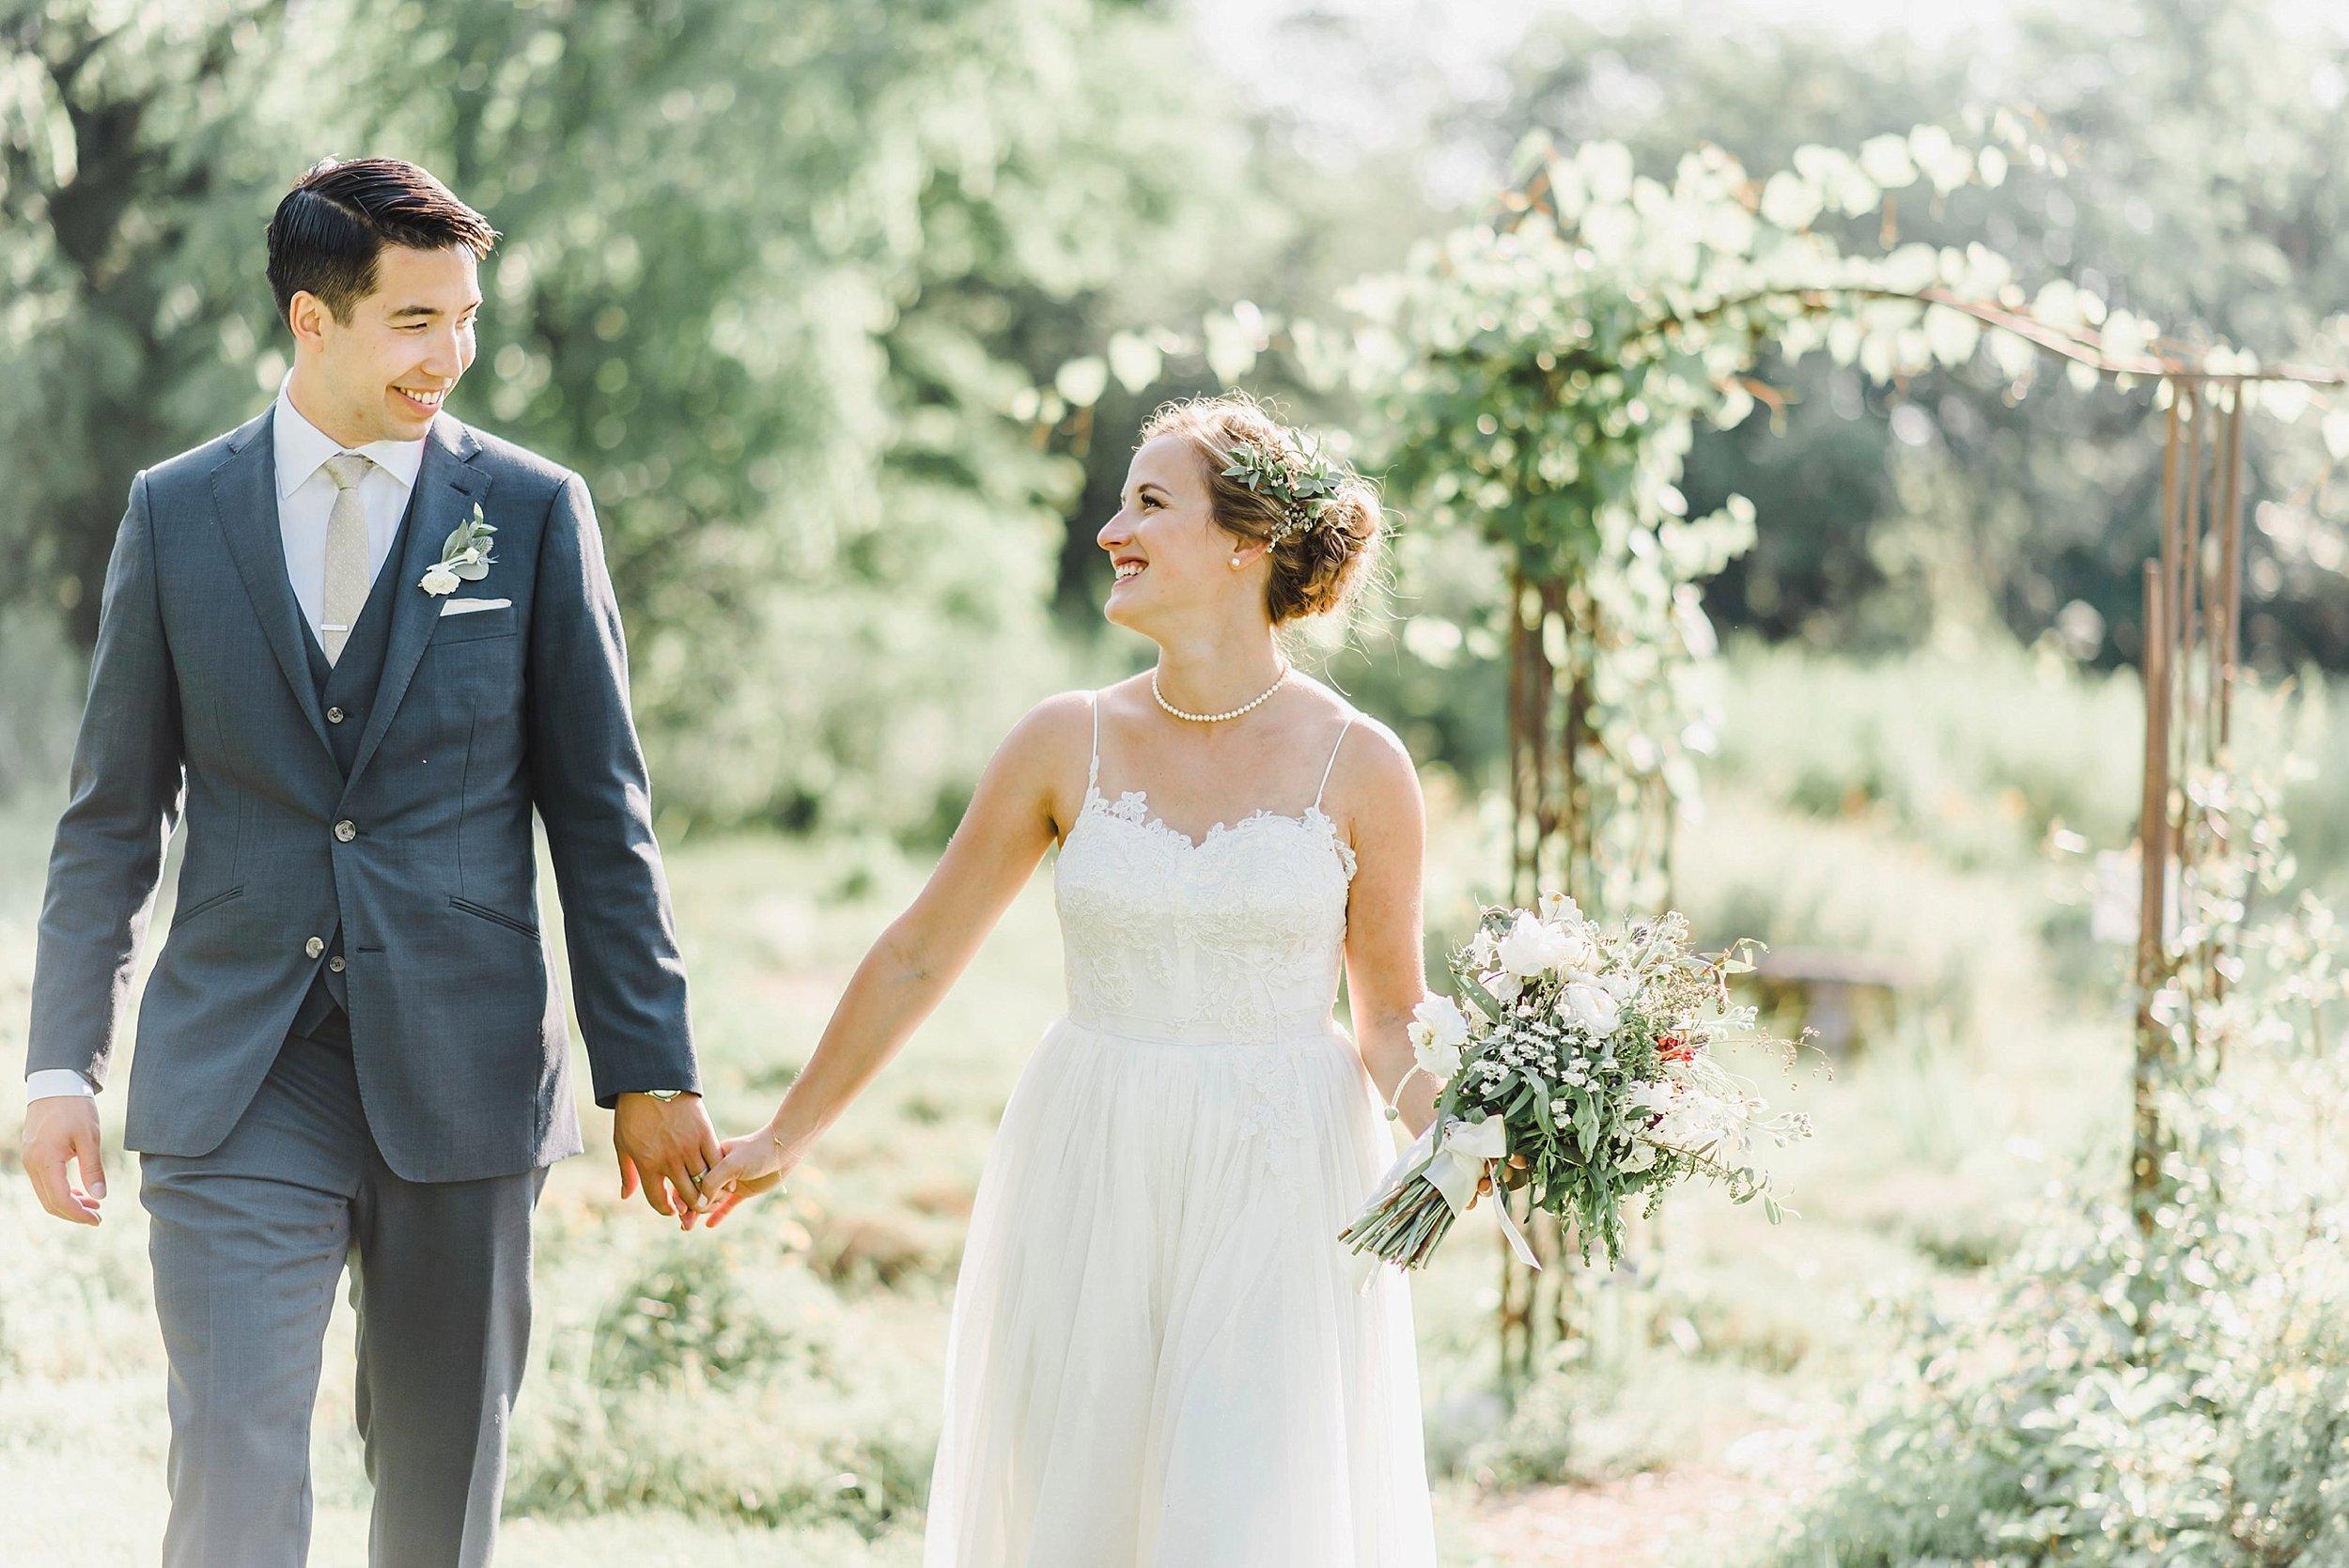 light airy indie fine art ottawa wedding photographer | Ali and Batoul Photography_0846.jpg